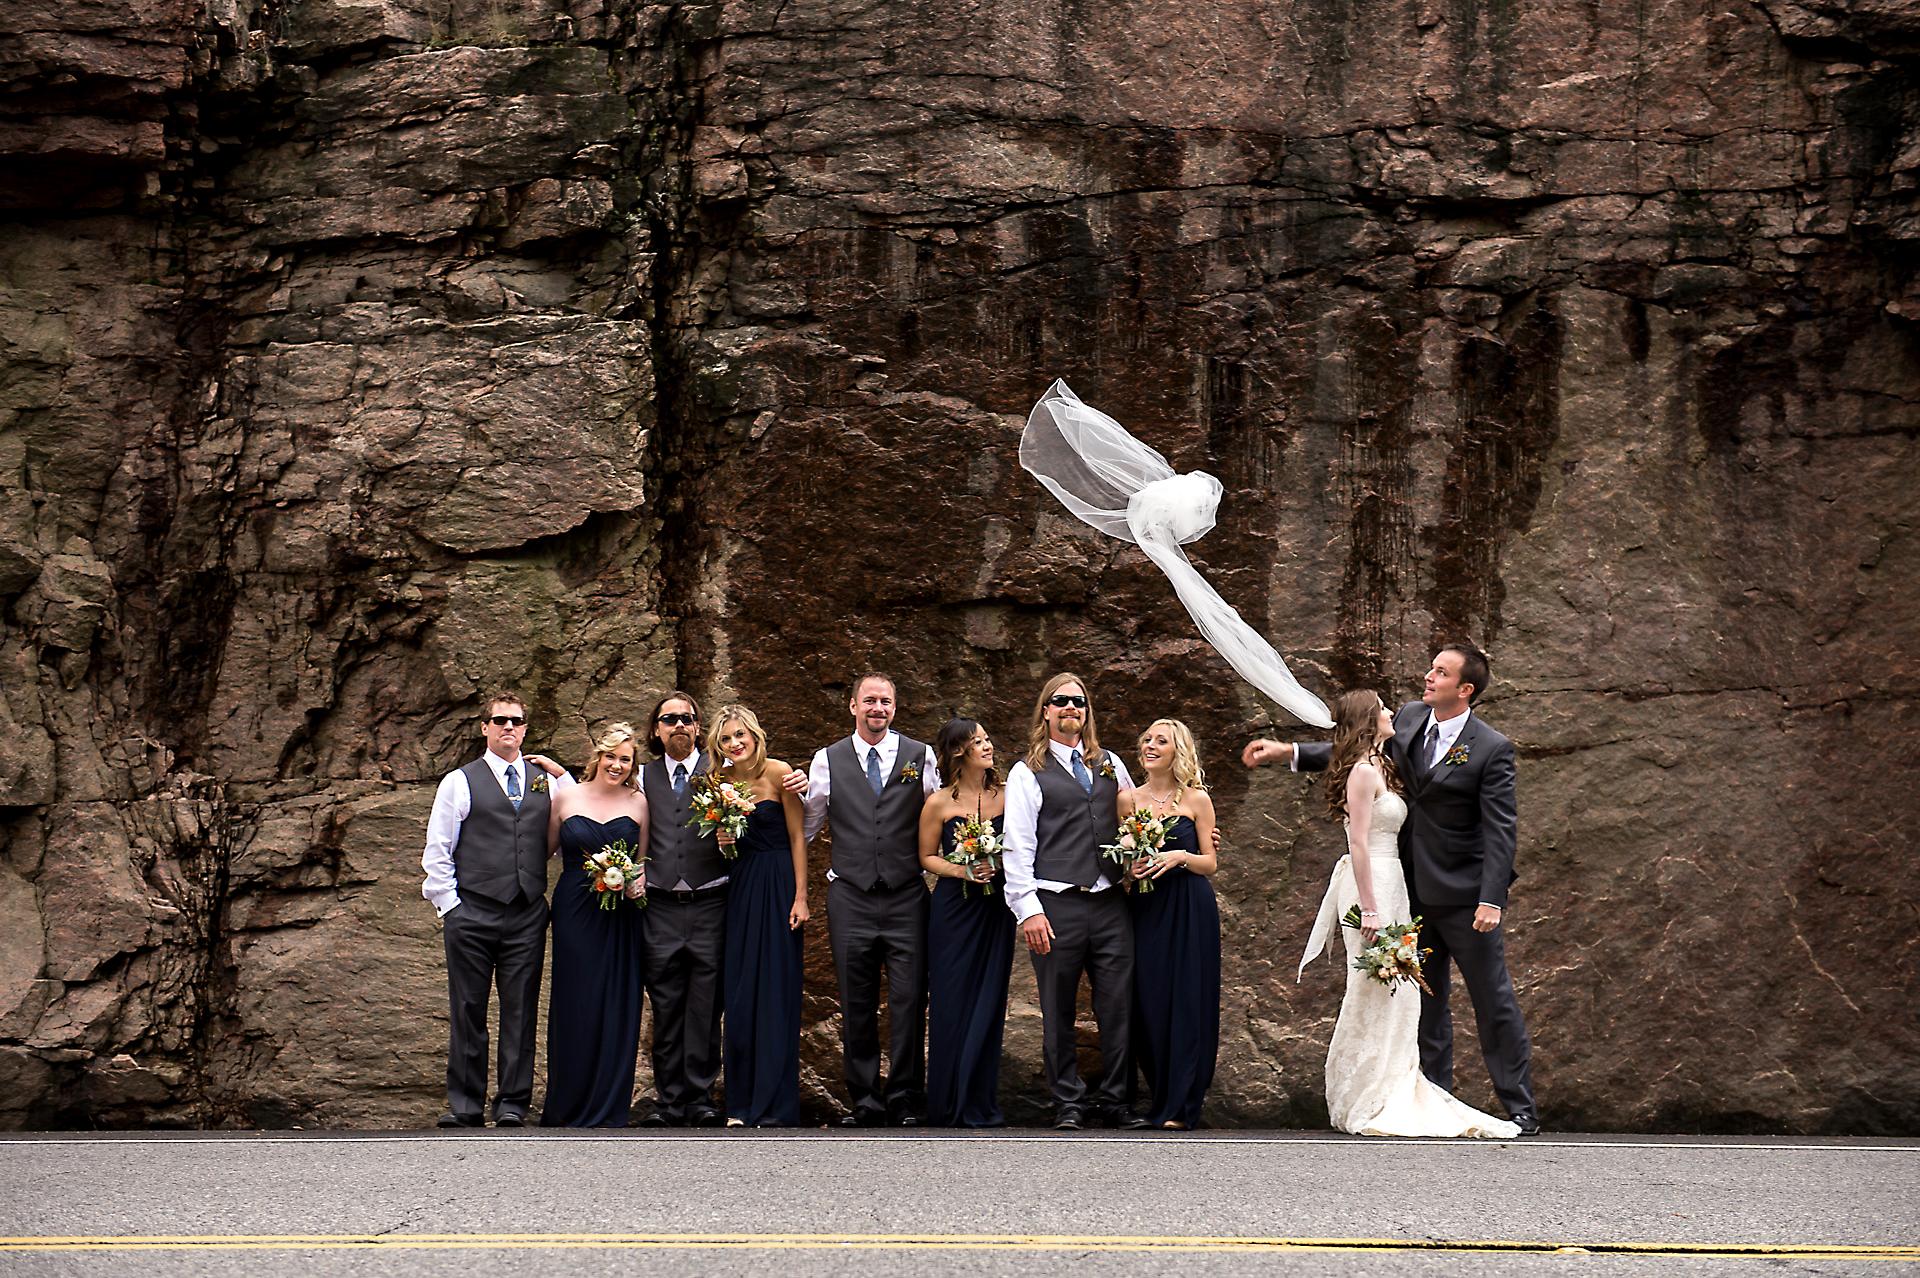 Nathan & Linda | Brooksfield Farms Wedding | Muskoka Wedding Photography24